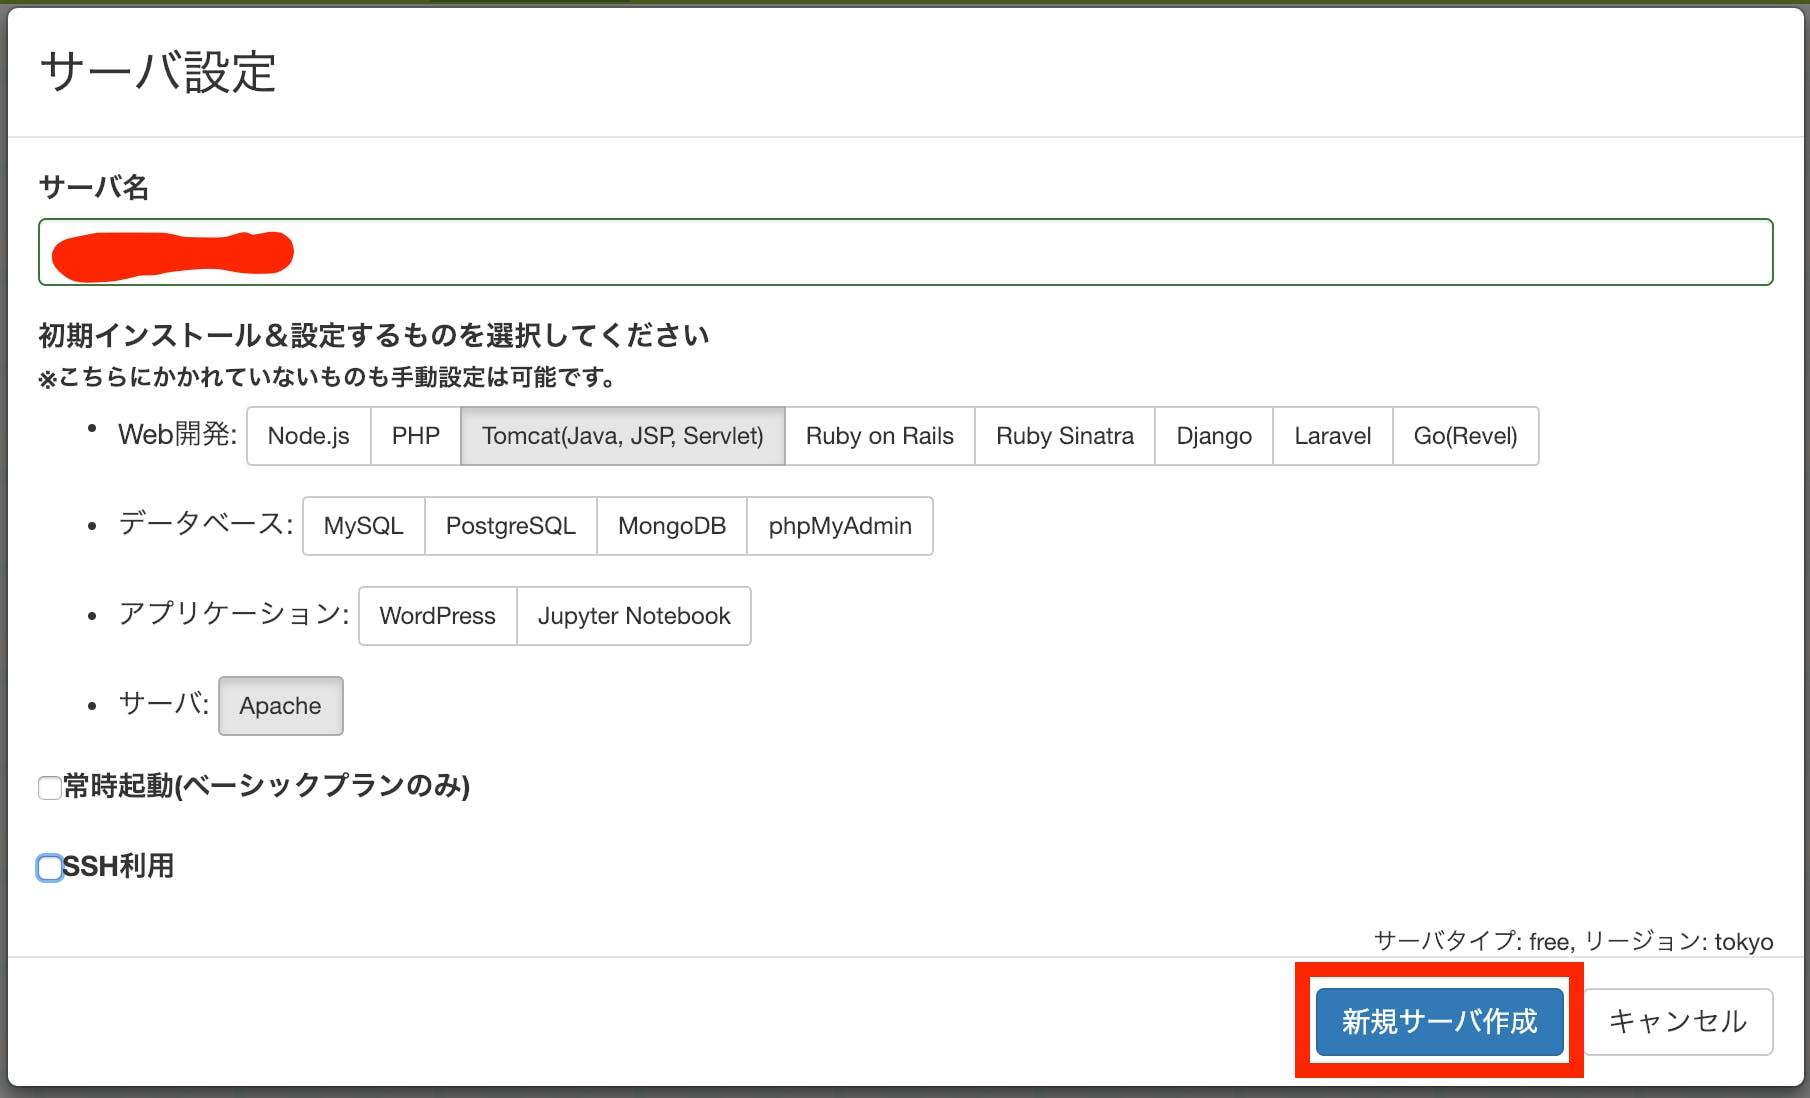 ScreenShot 7.png